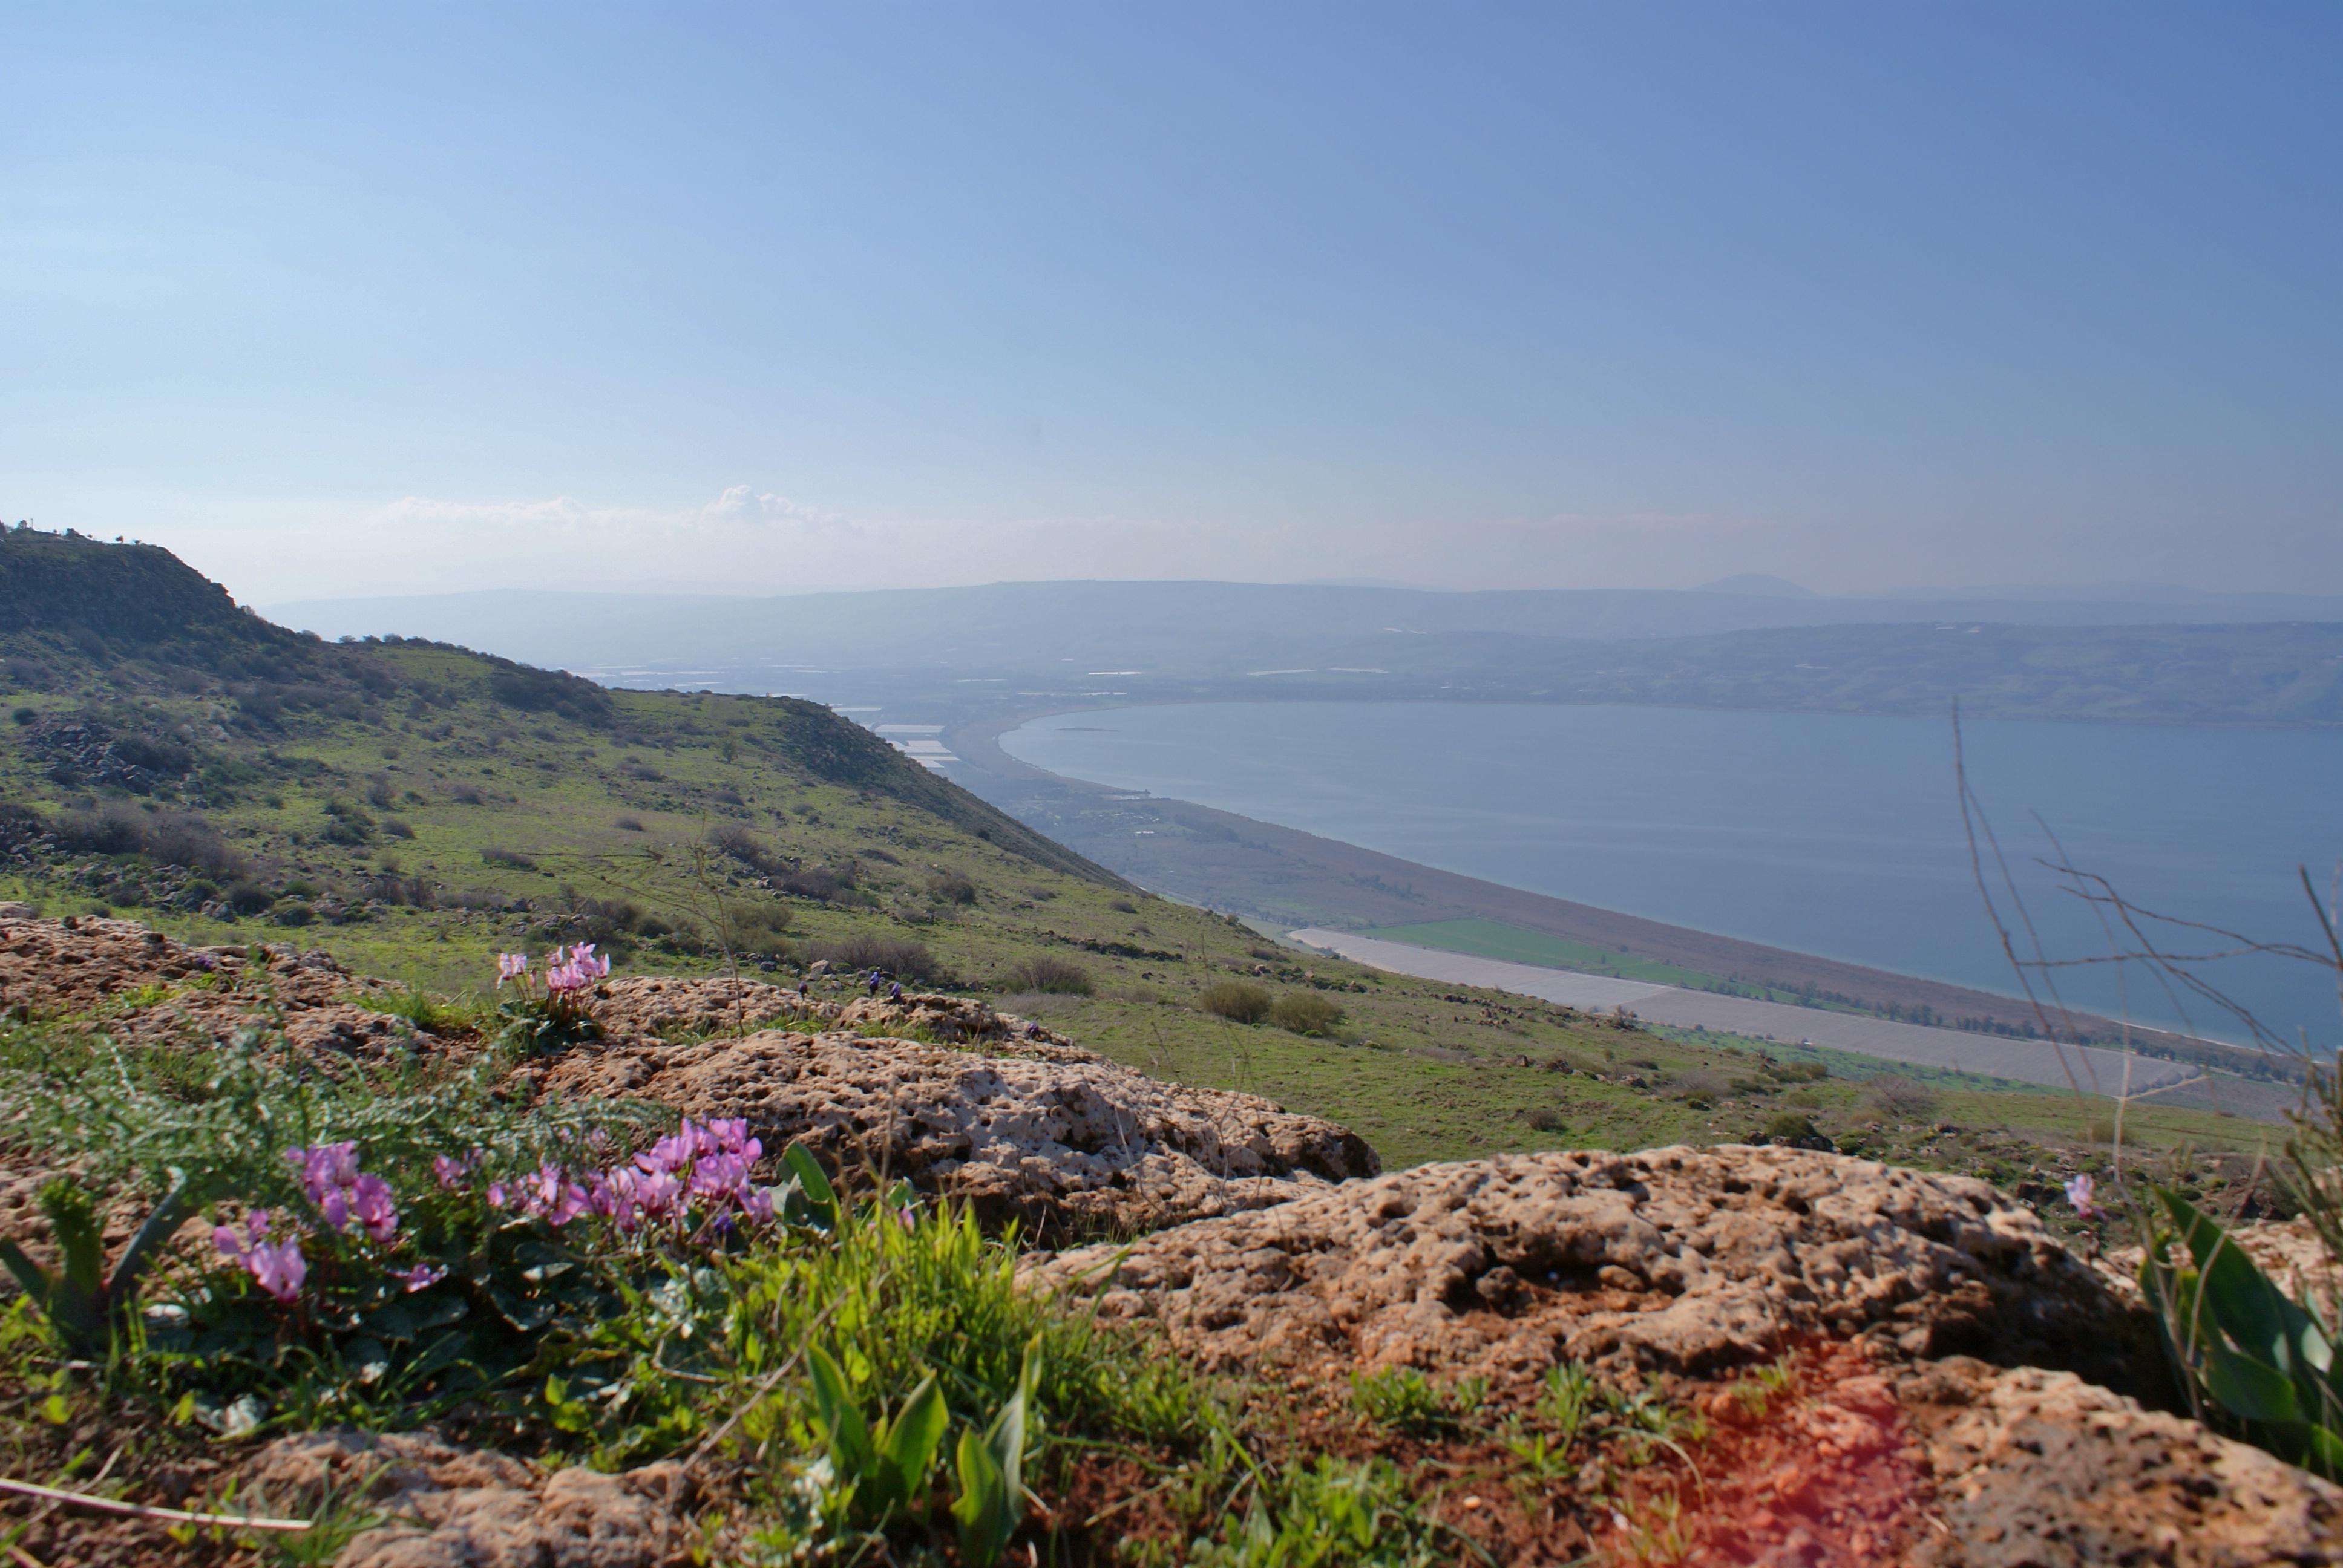 Kinneret Israel  city photo : The Kinneret Sea of Galilee has risen considerably since the ...